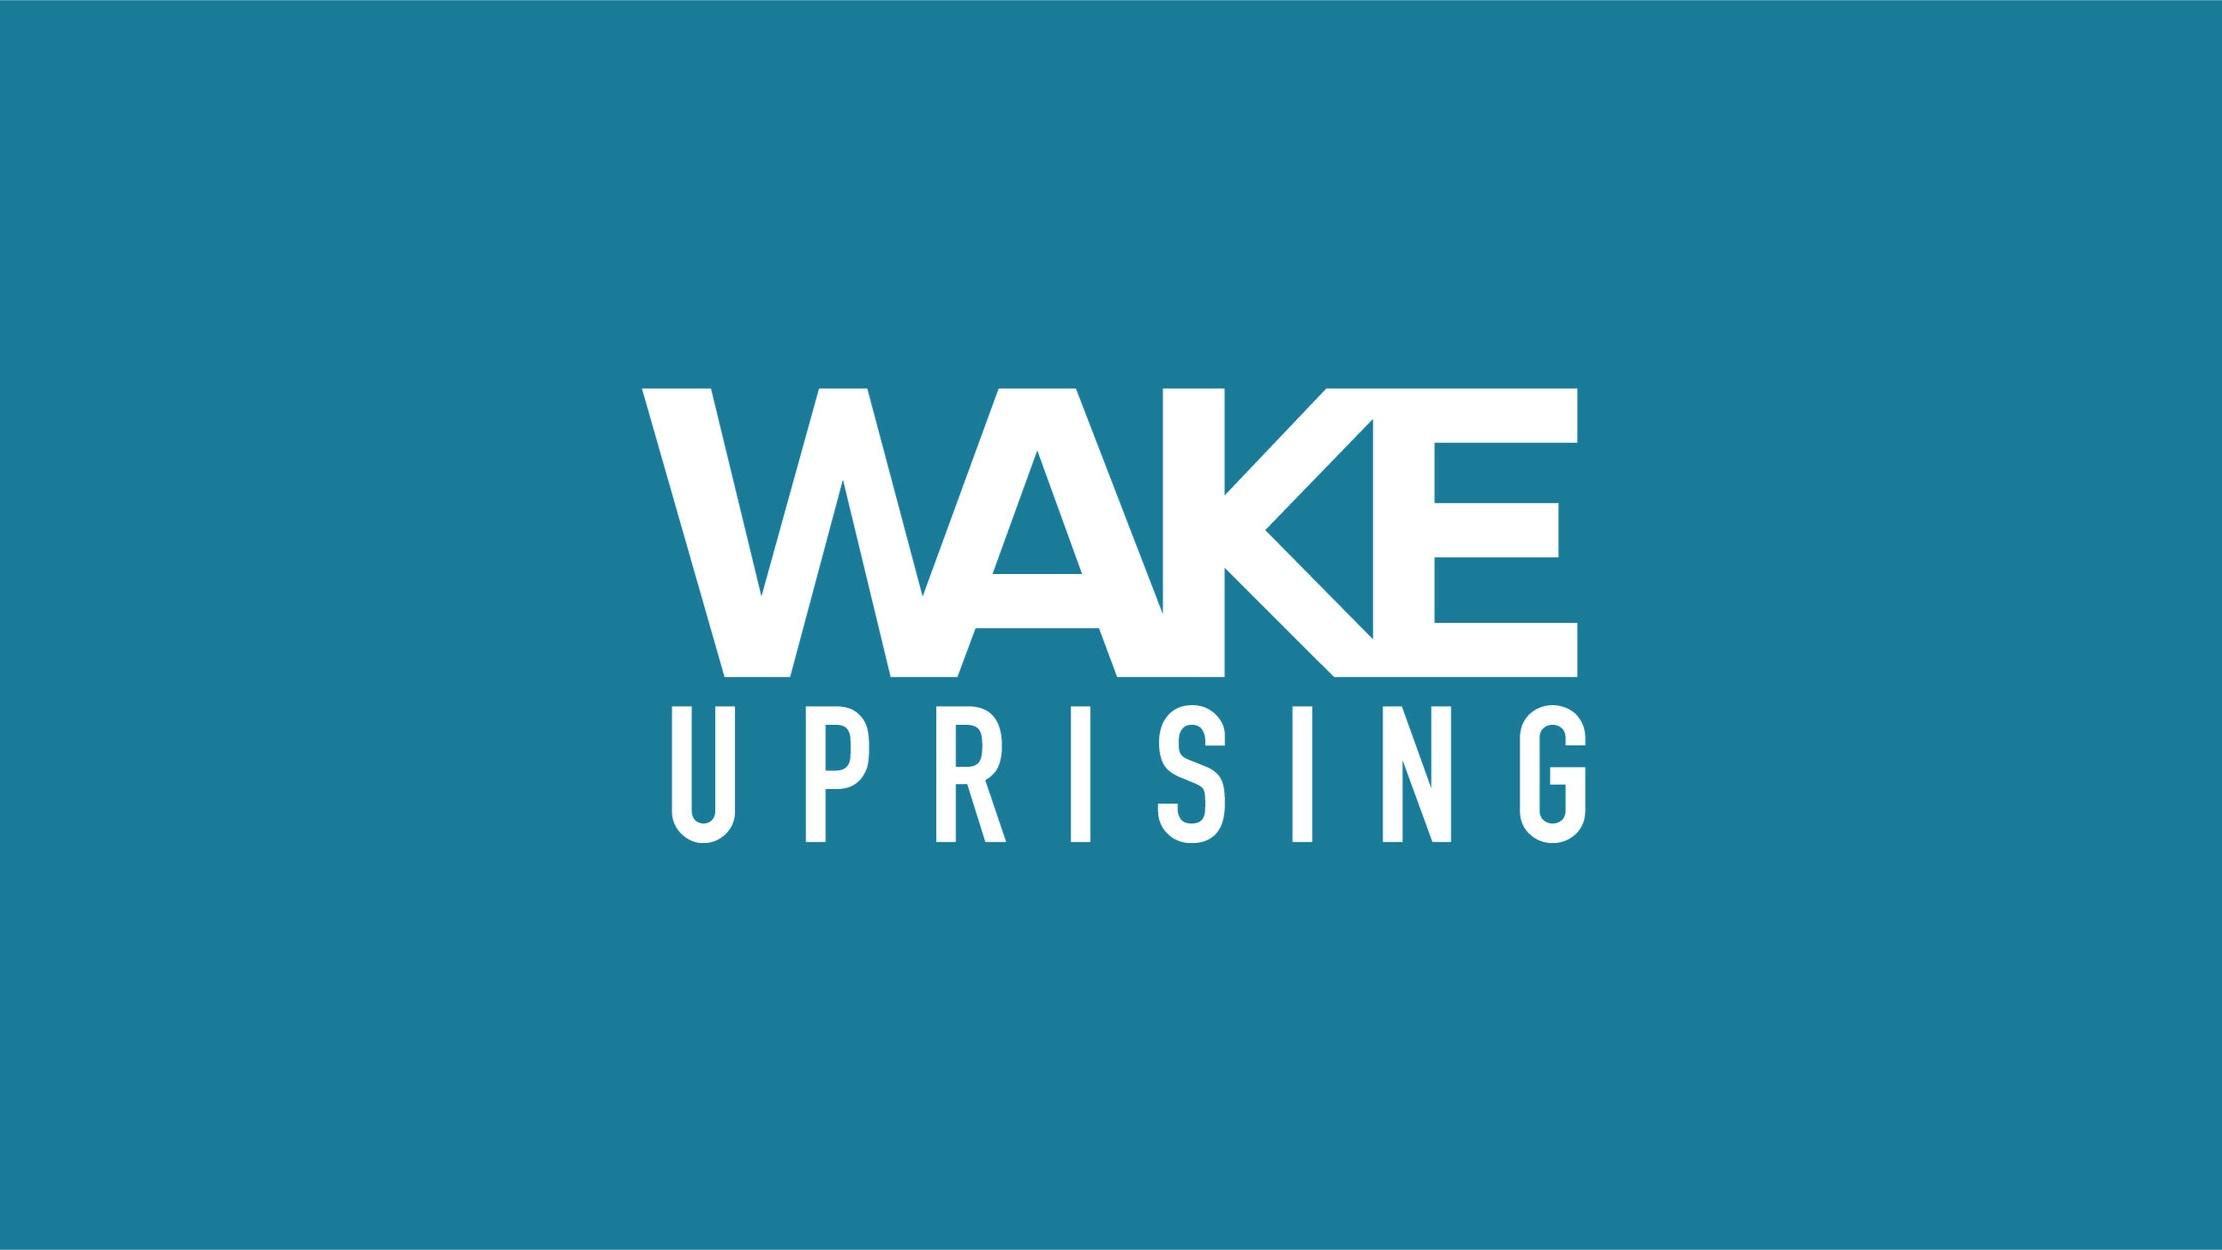 WAKE+Uprising+1-05.jpg